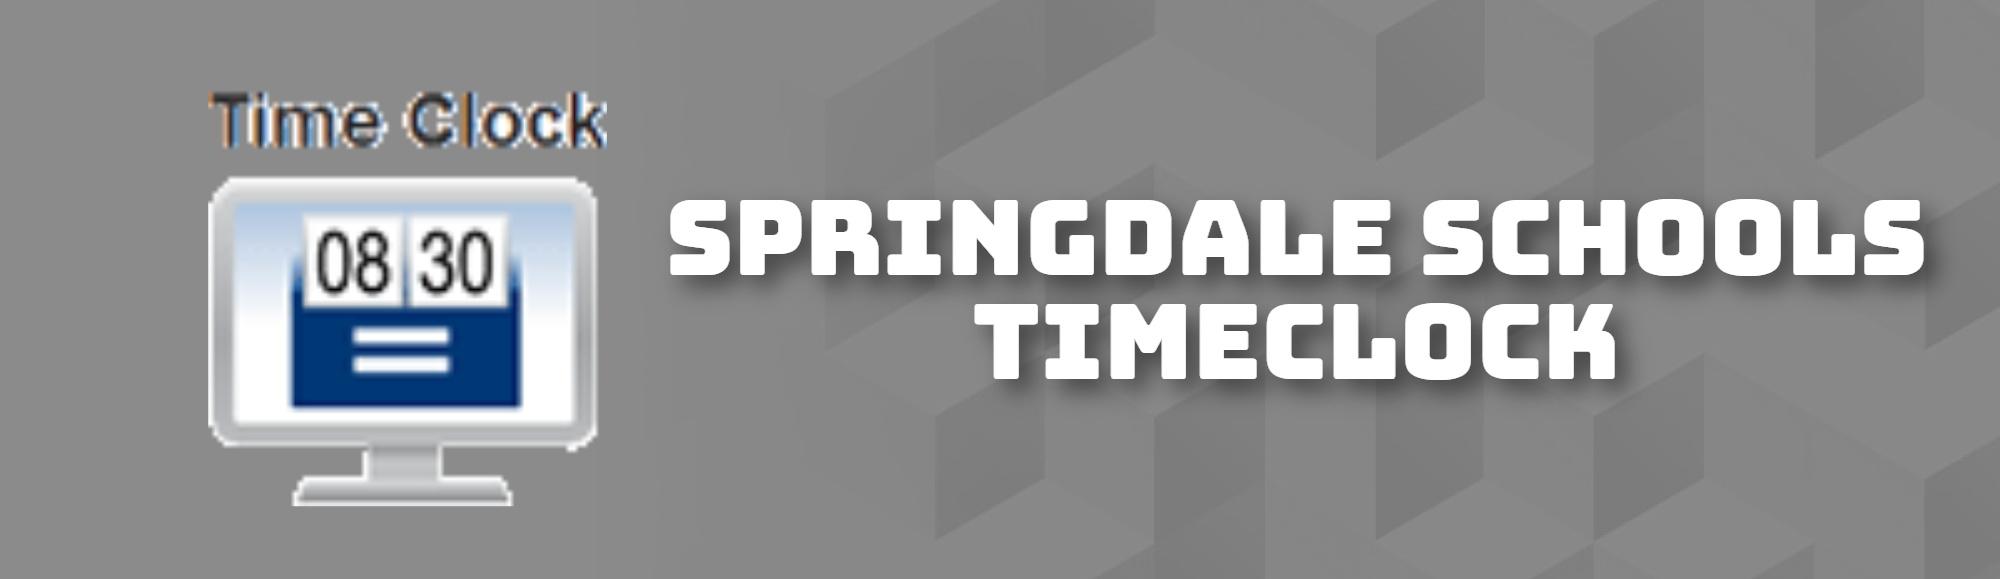 SPRINGDALE SCHOOLS TIMECLOCK